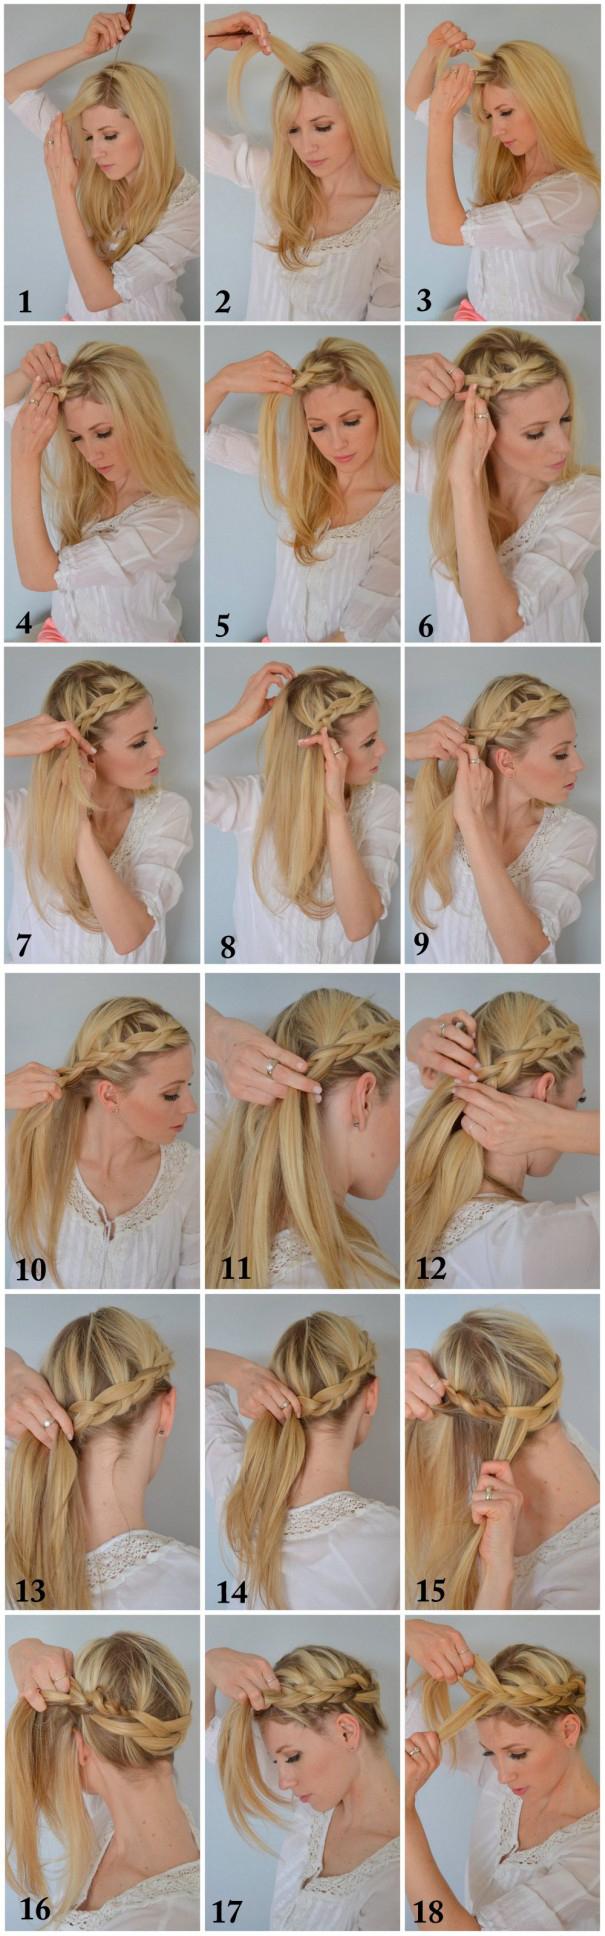 Boho Braided Crown Hairstyle Tutorial